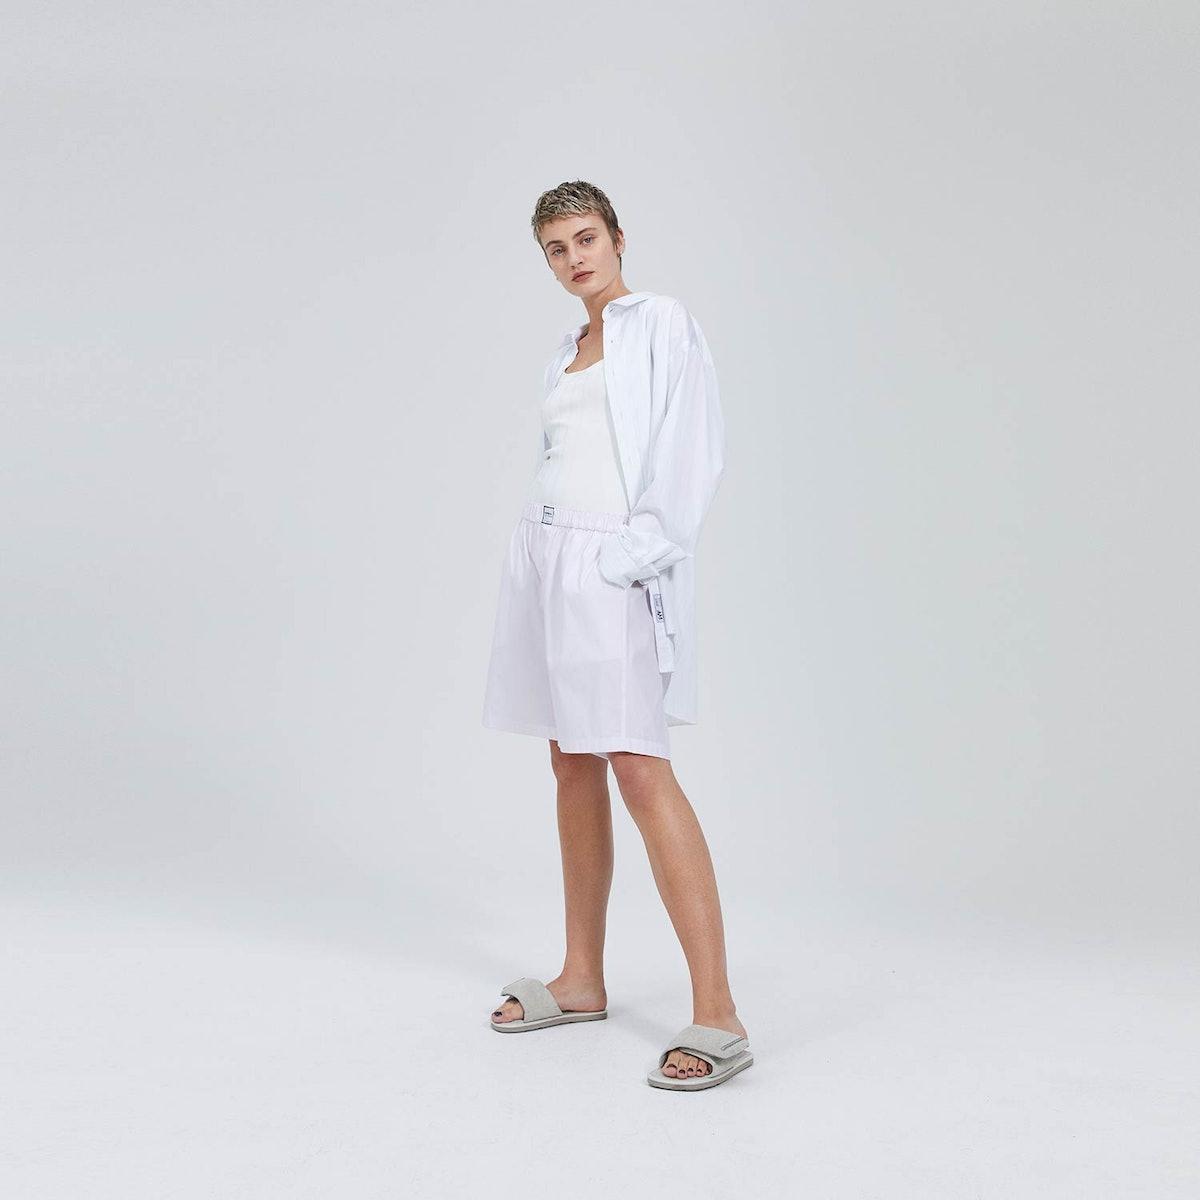 Aniara Shorts